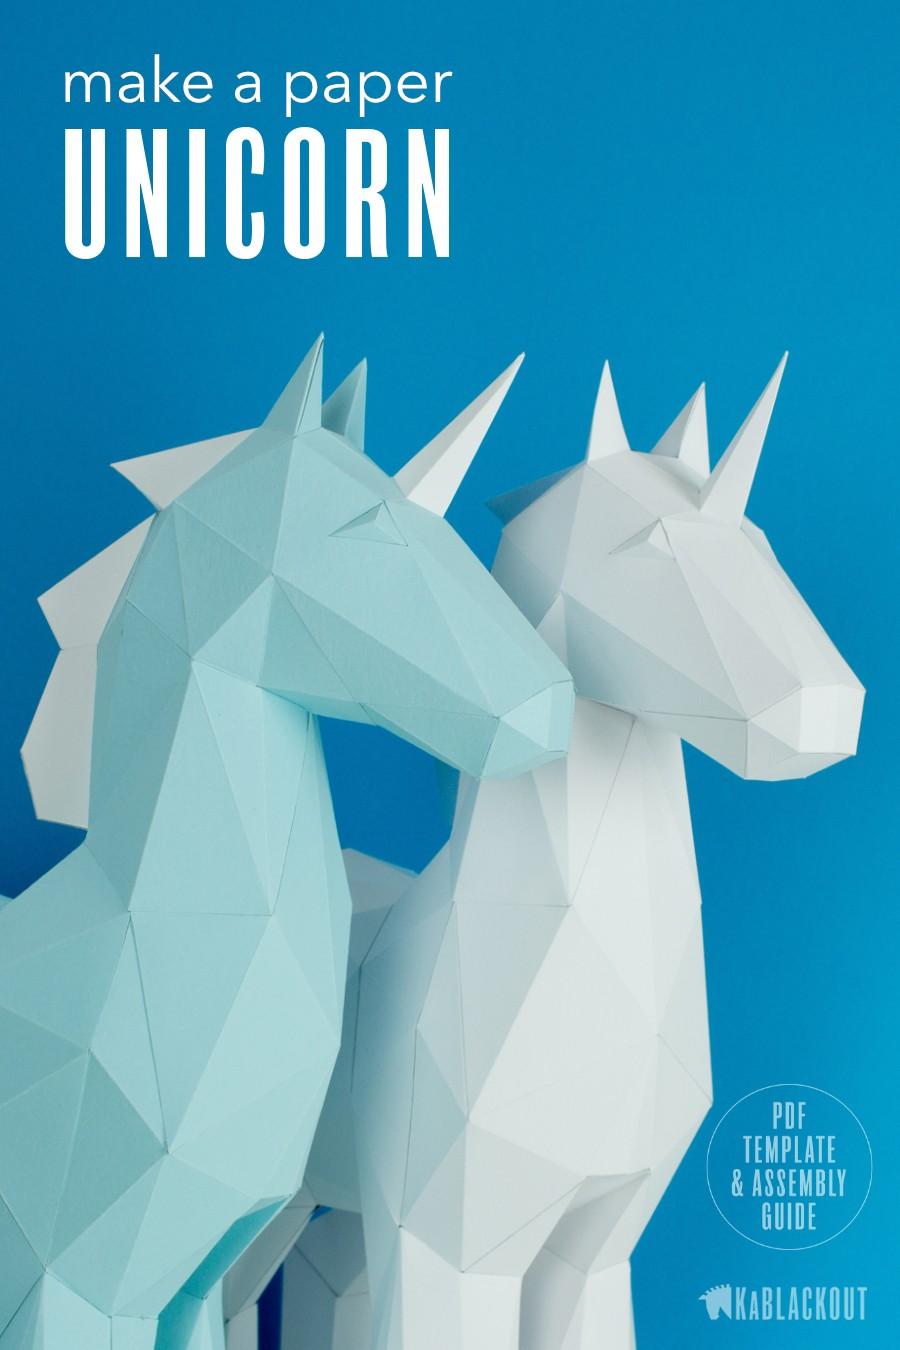 Ceiling Cat Papercraft Papercraft Unicorn Template Diy Unicorn Papercraft Low Poly